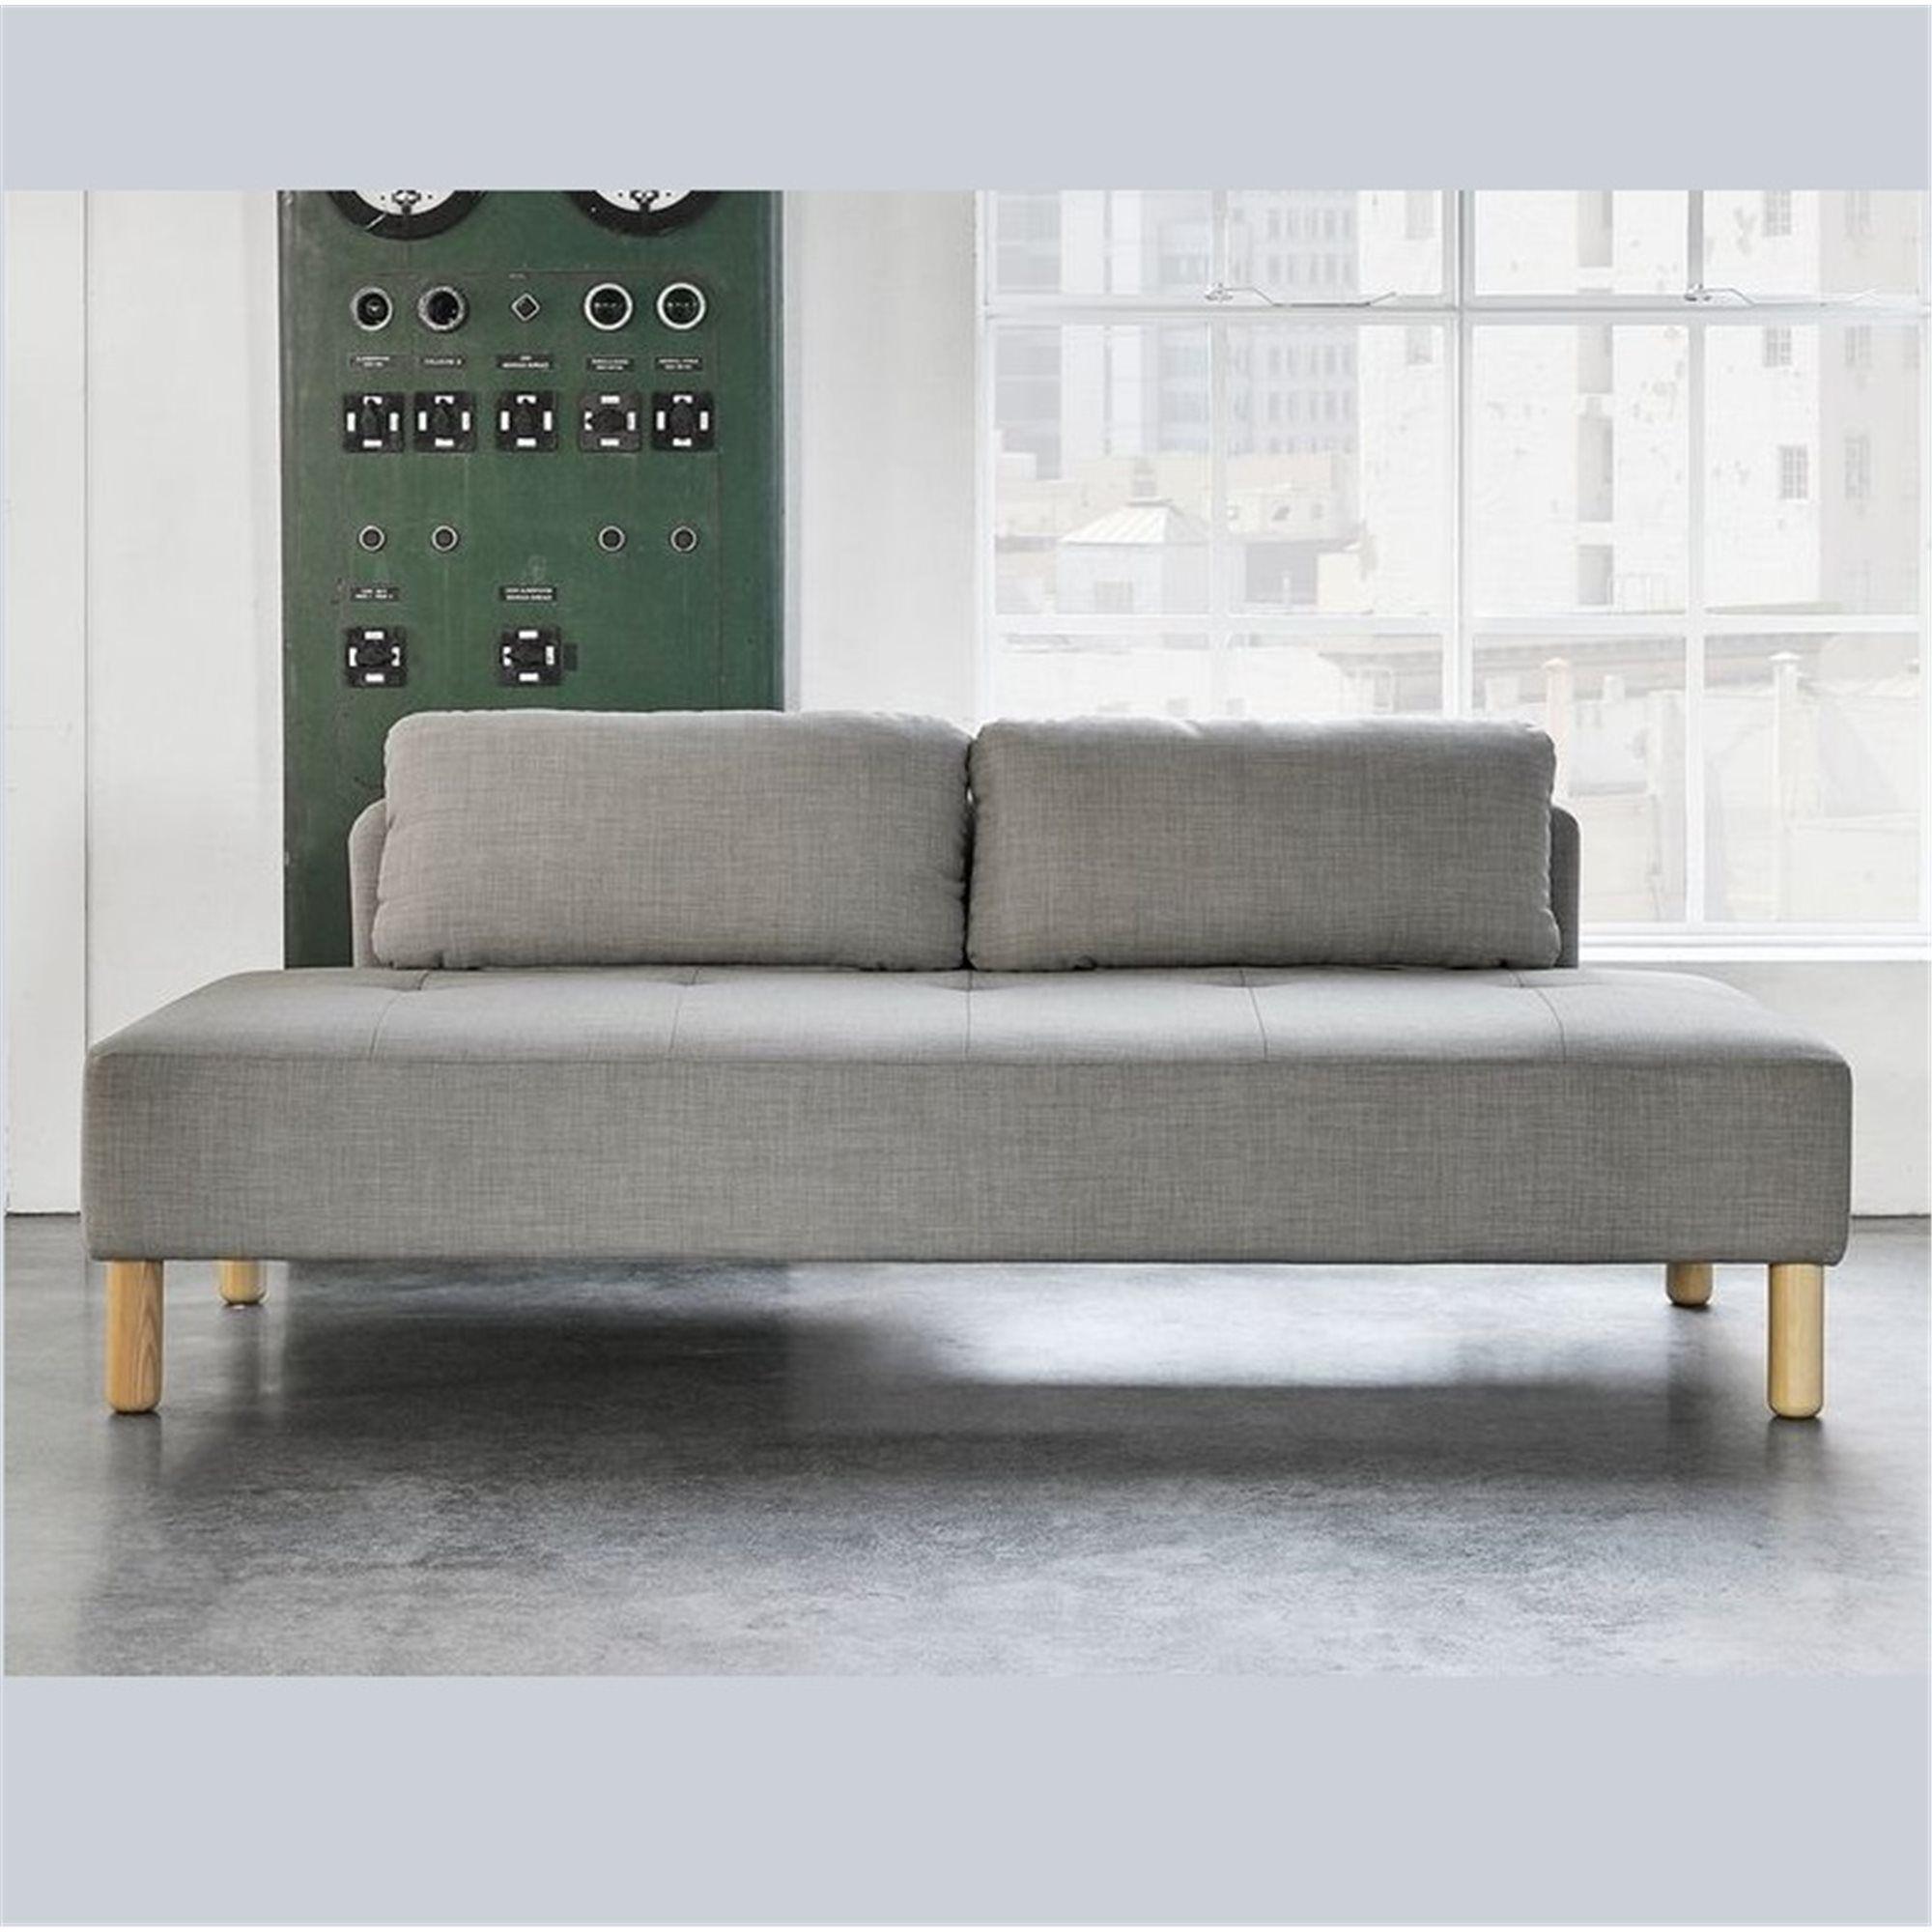 Awe Inspiring Sega Sofa Bed Heminredning Heminterior Soffa Baddsoffa Onthecornerstone Fun Painted Chair Ideas Images Onthecornerstoneorg